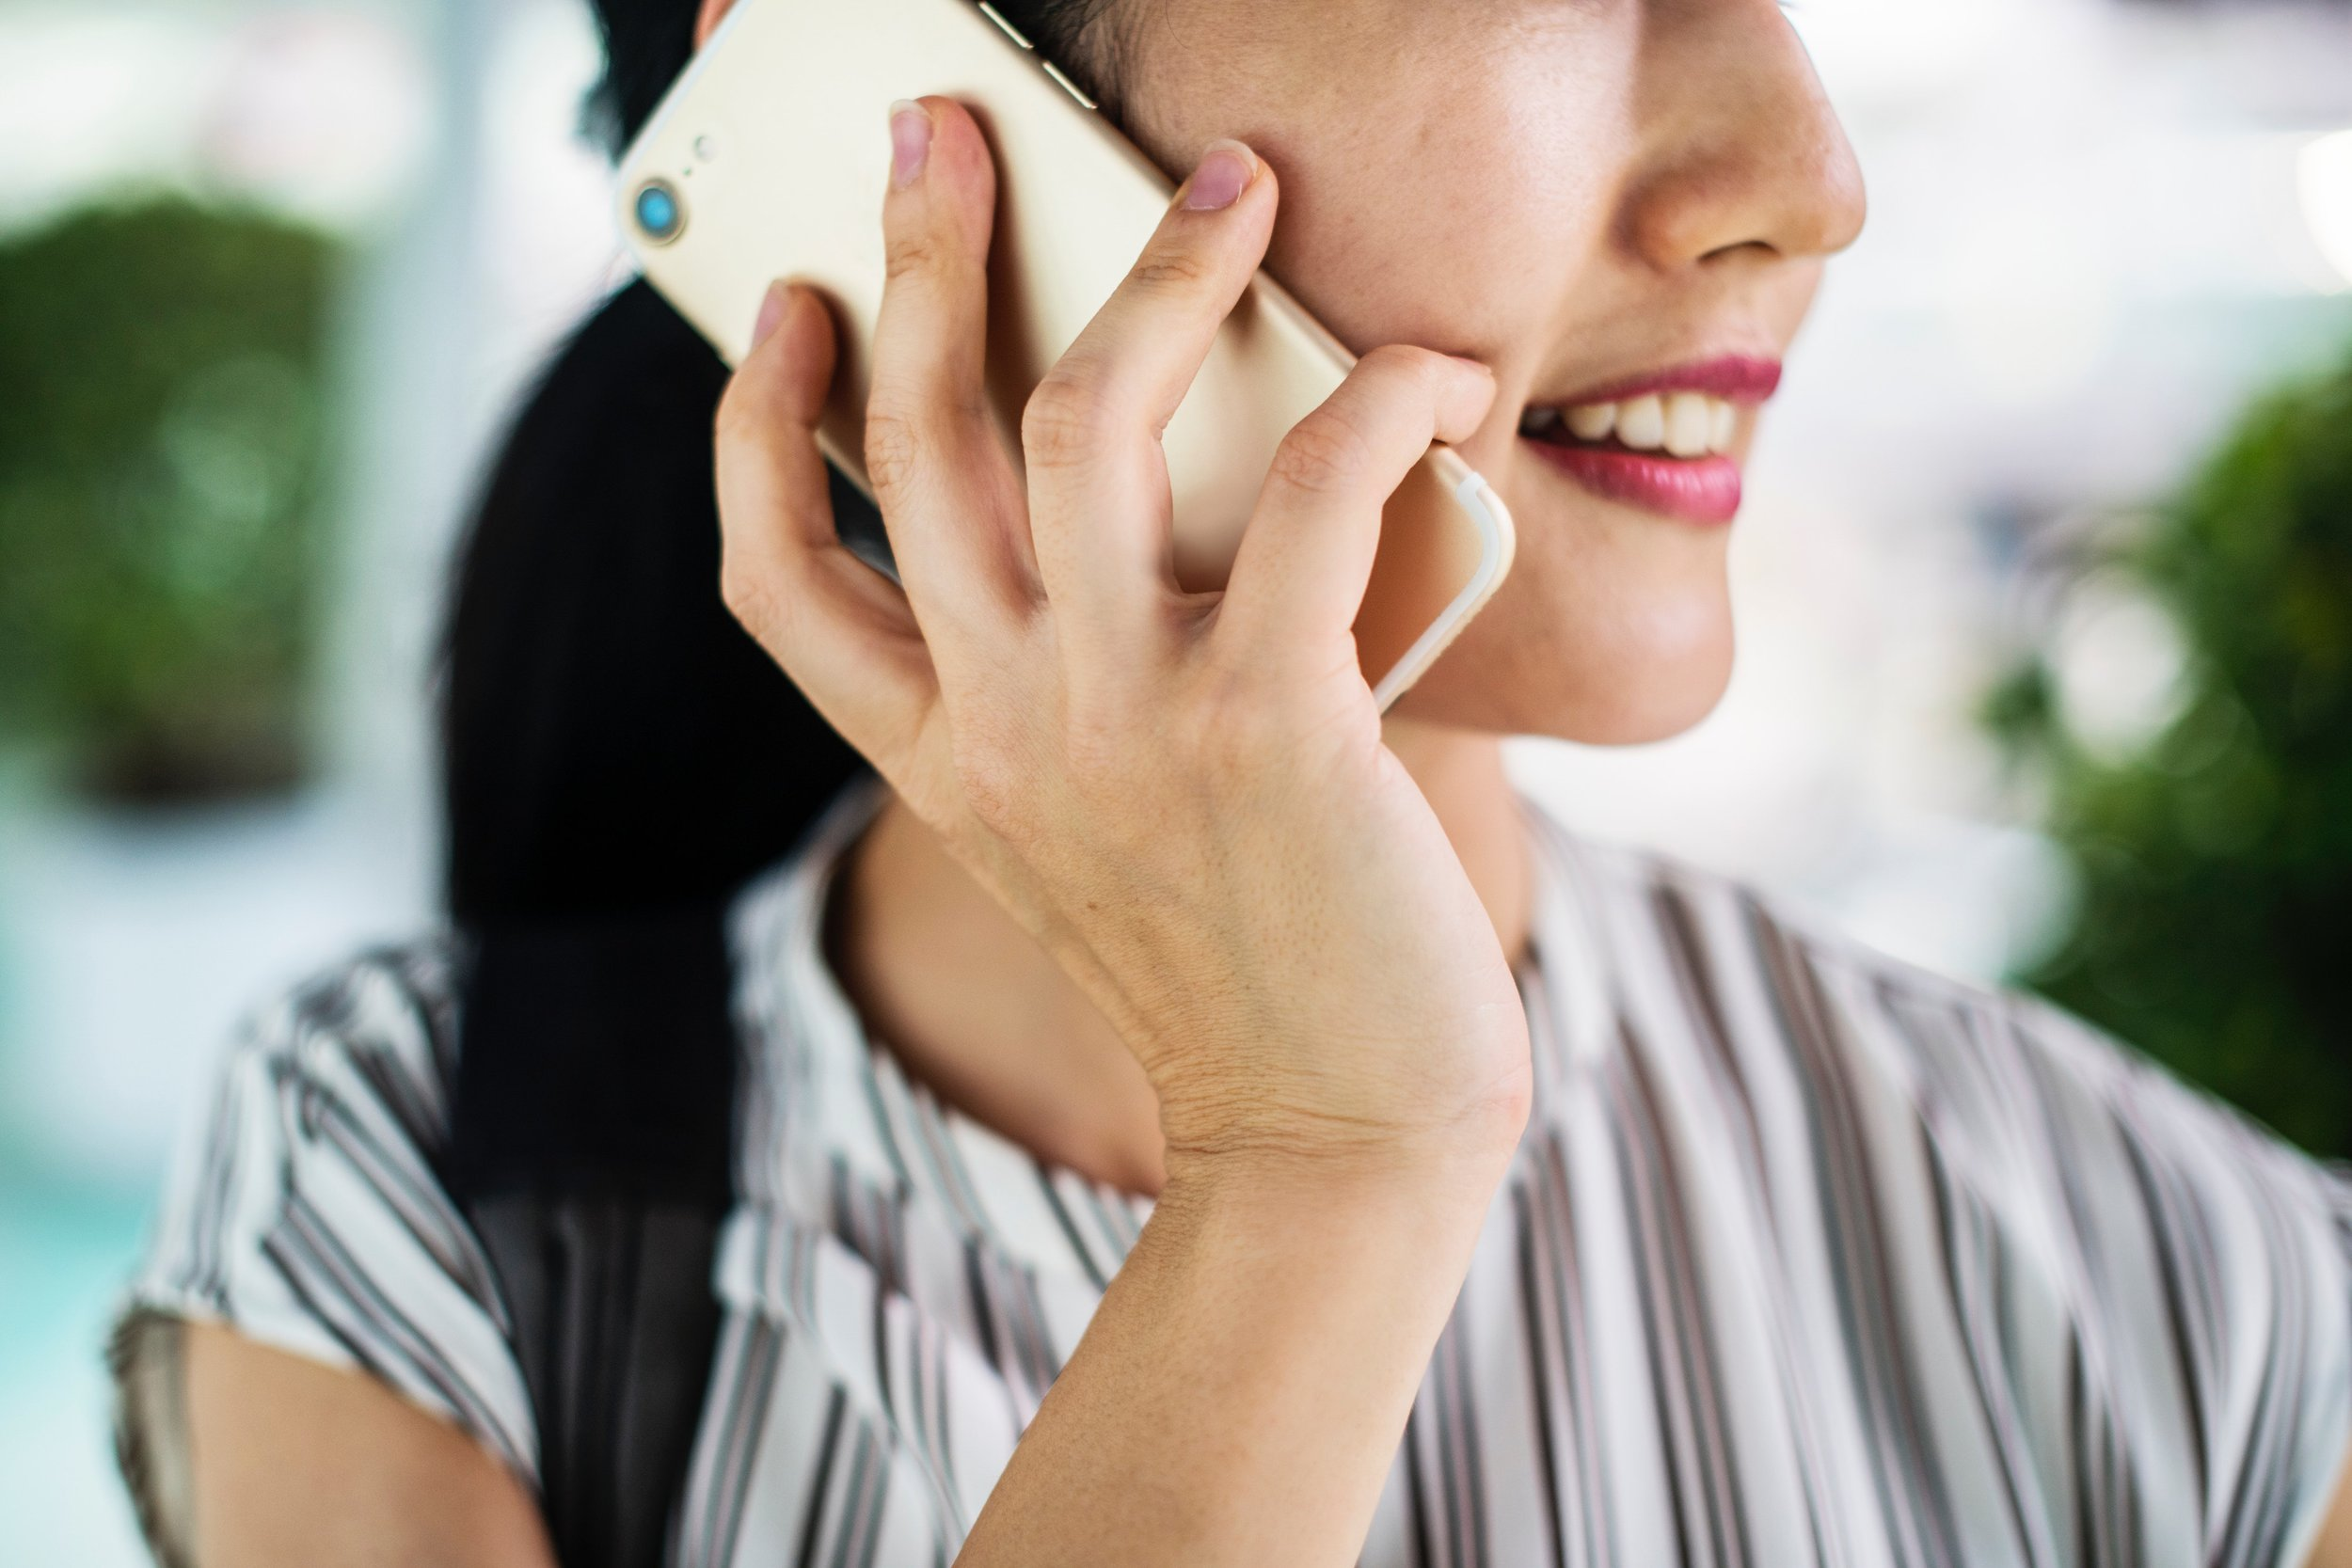 call-calling-cellphone-1162966.jpg